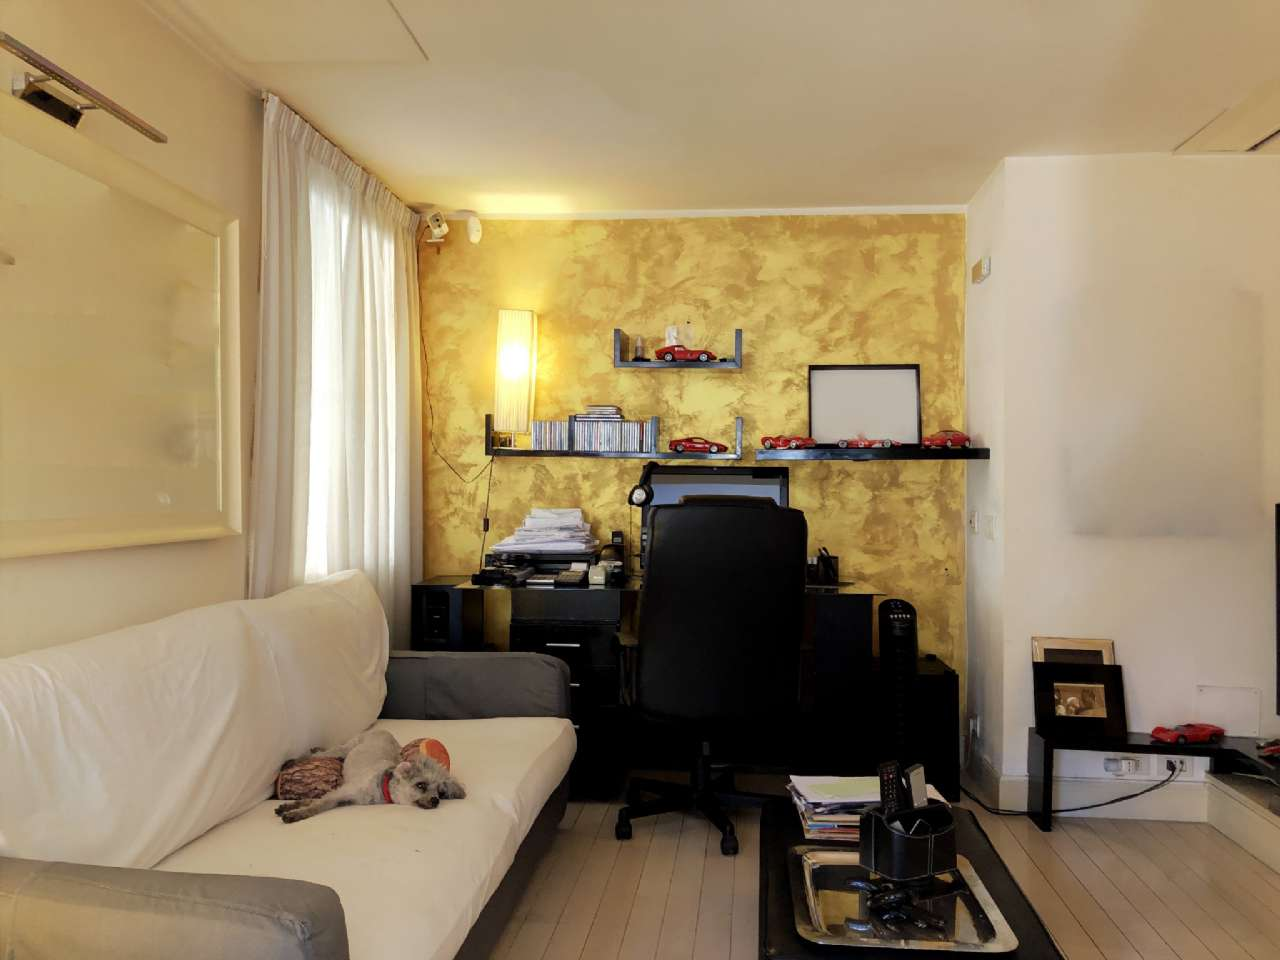 Appartamento, Via dei Monti Parioli, Roma, foto 2